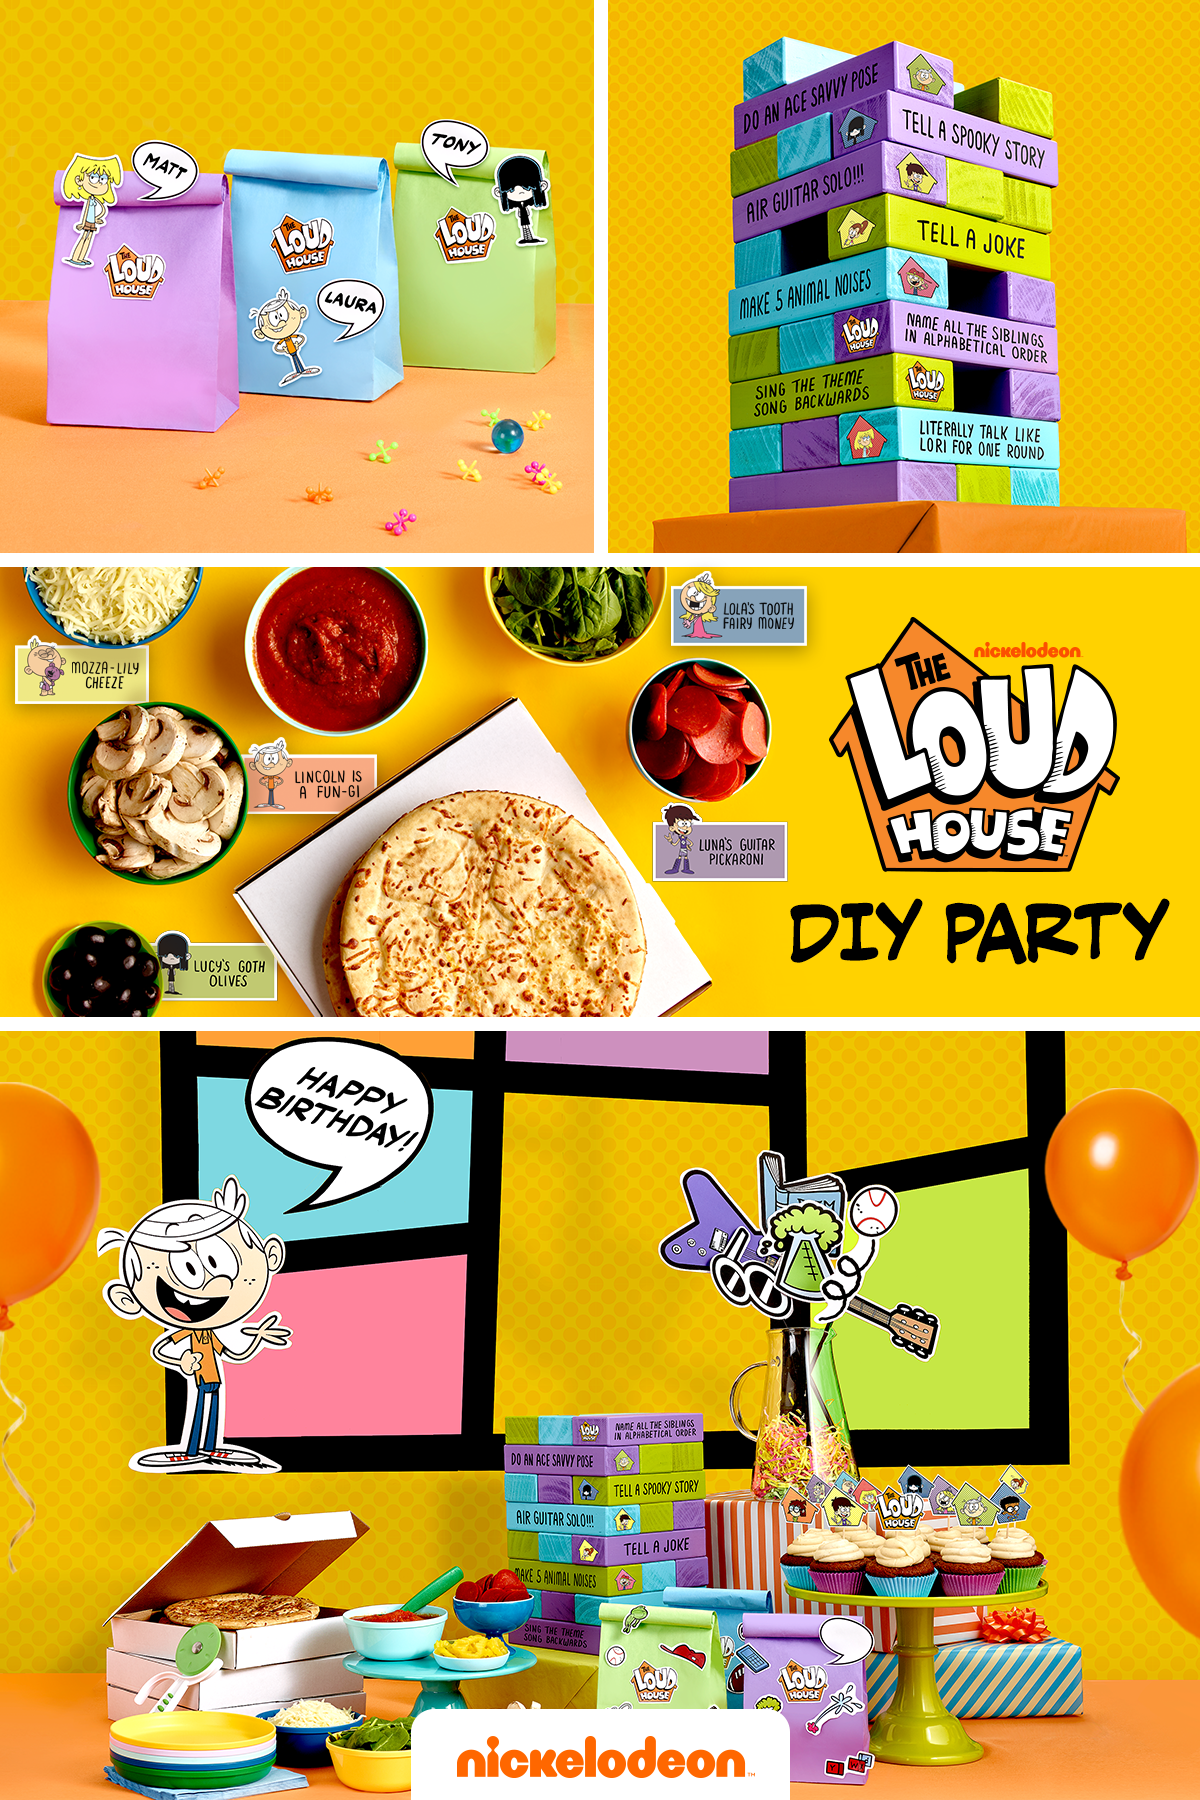 Plan a Loud House Party